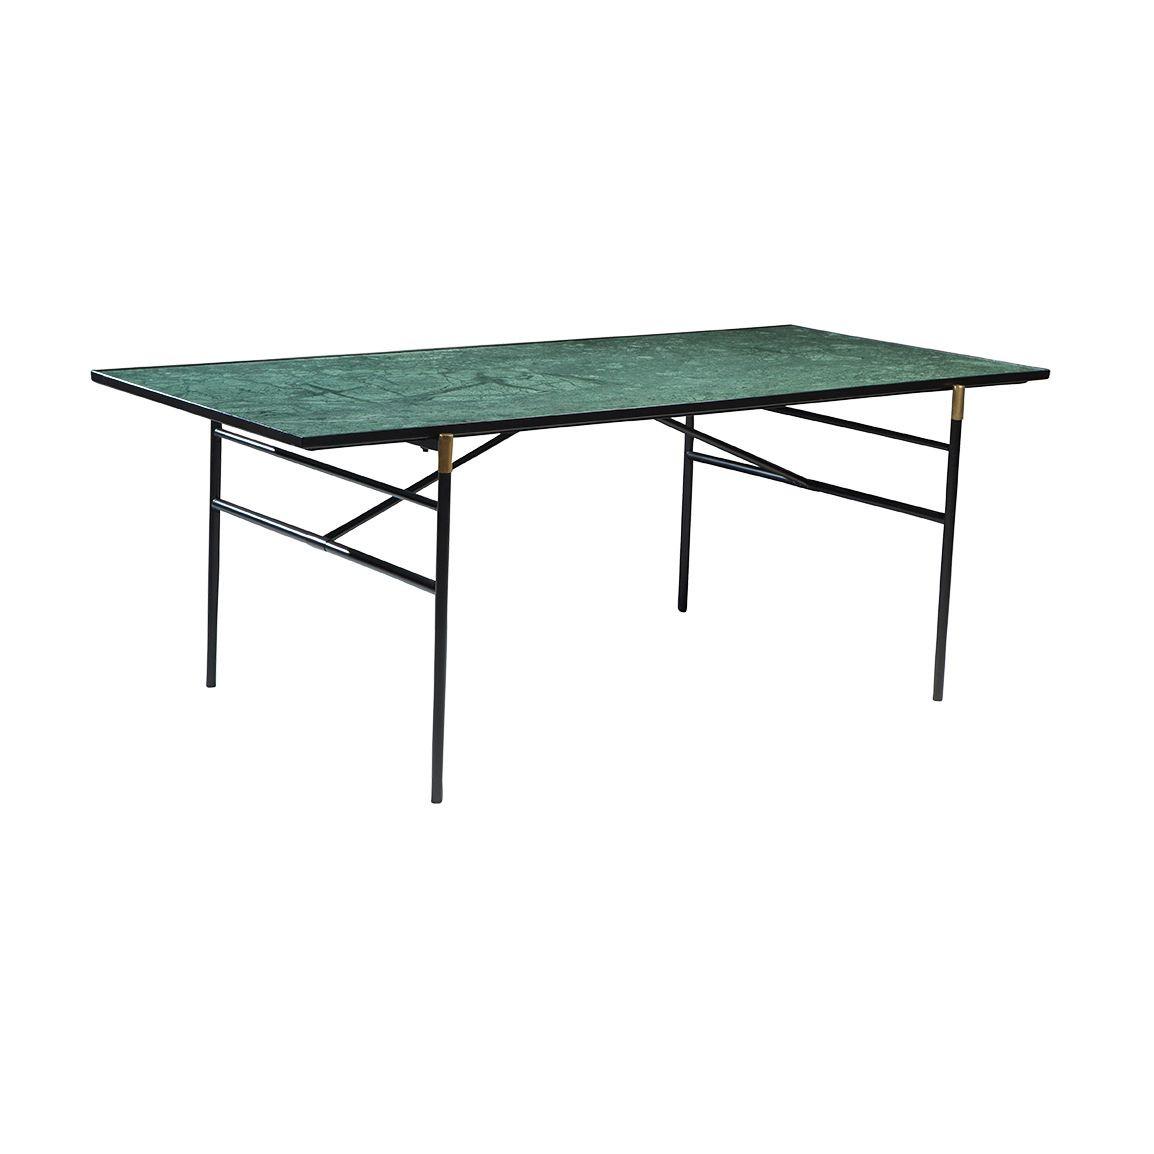 Dining Table Mood  | Green Marble / Black Legs